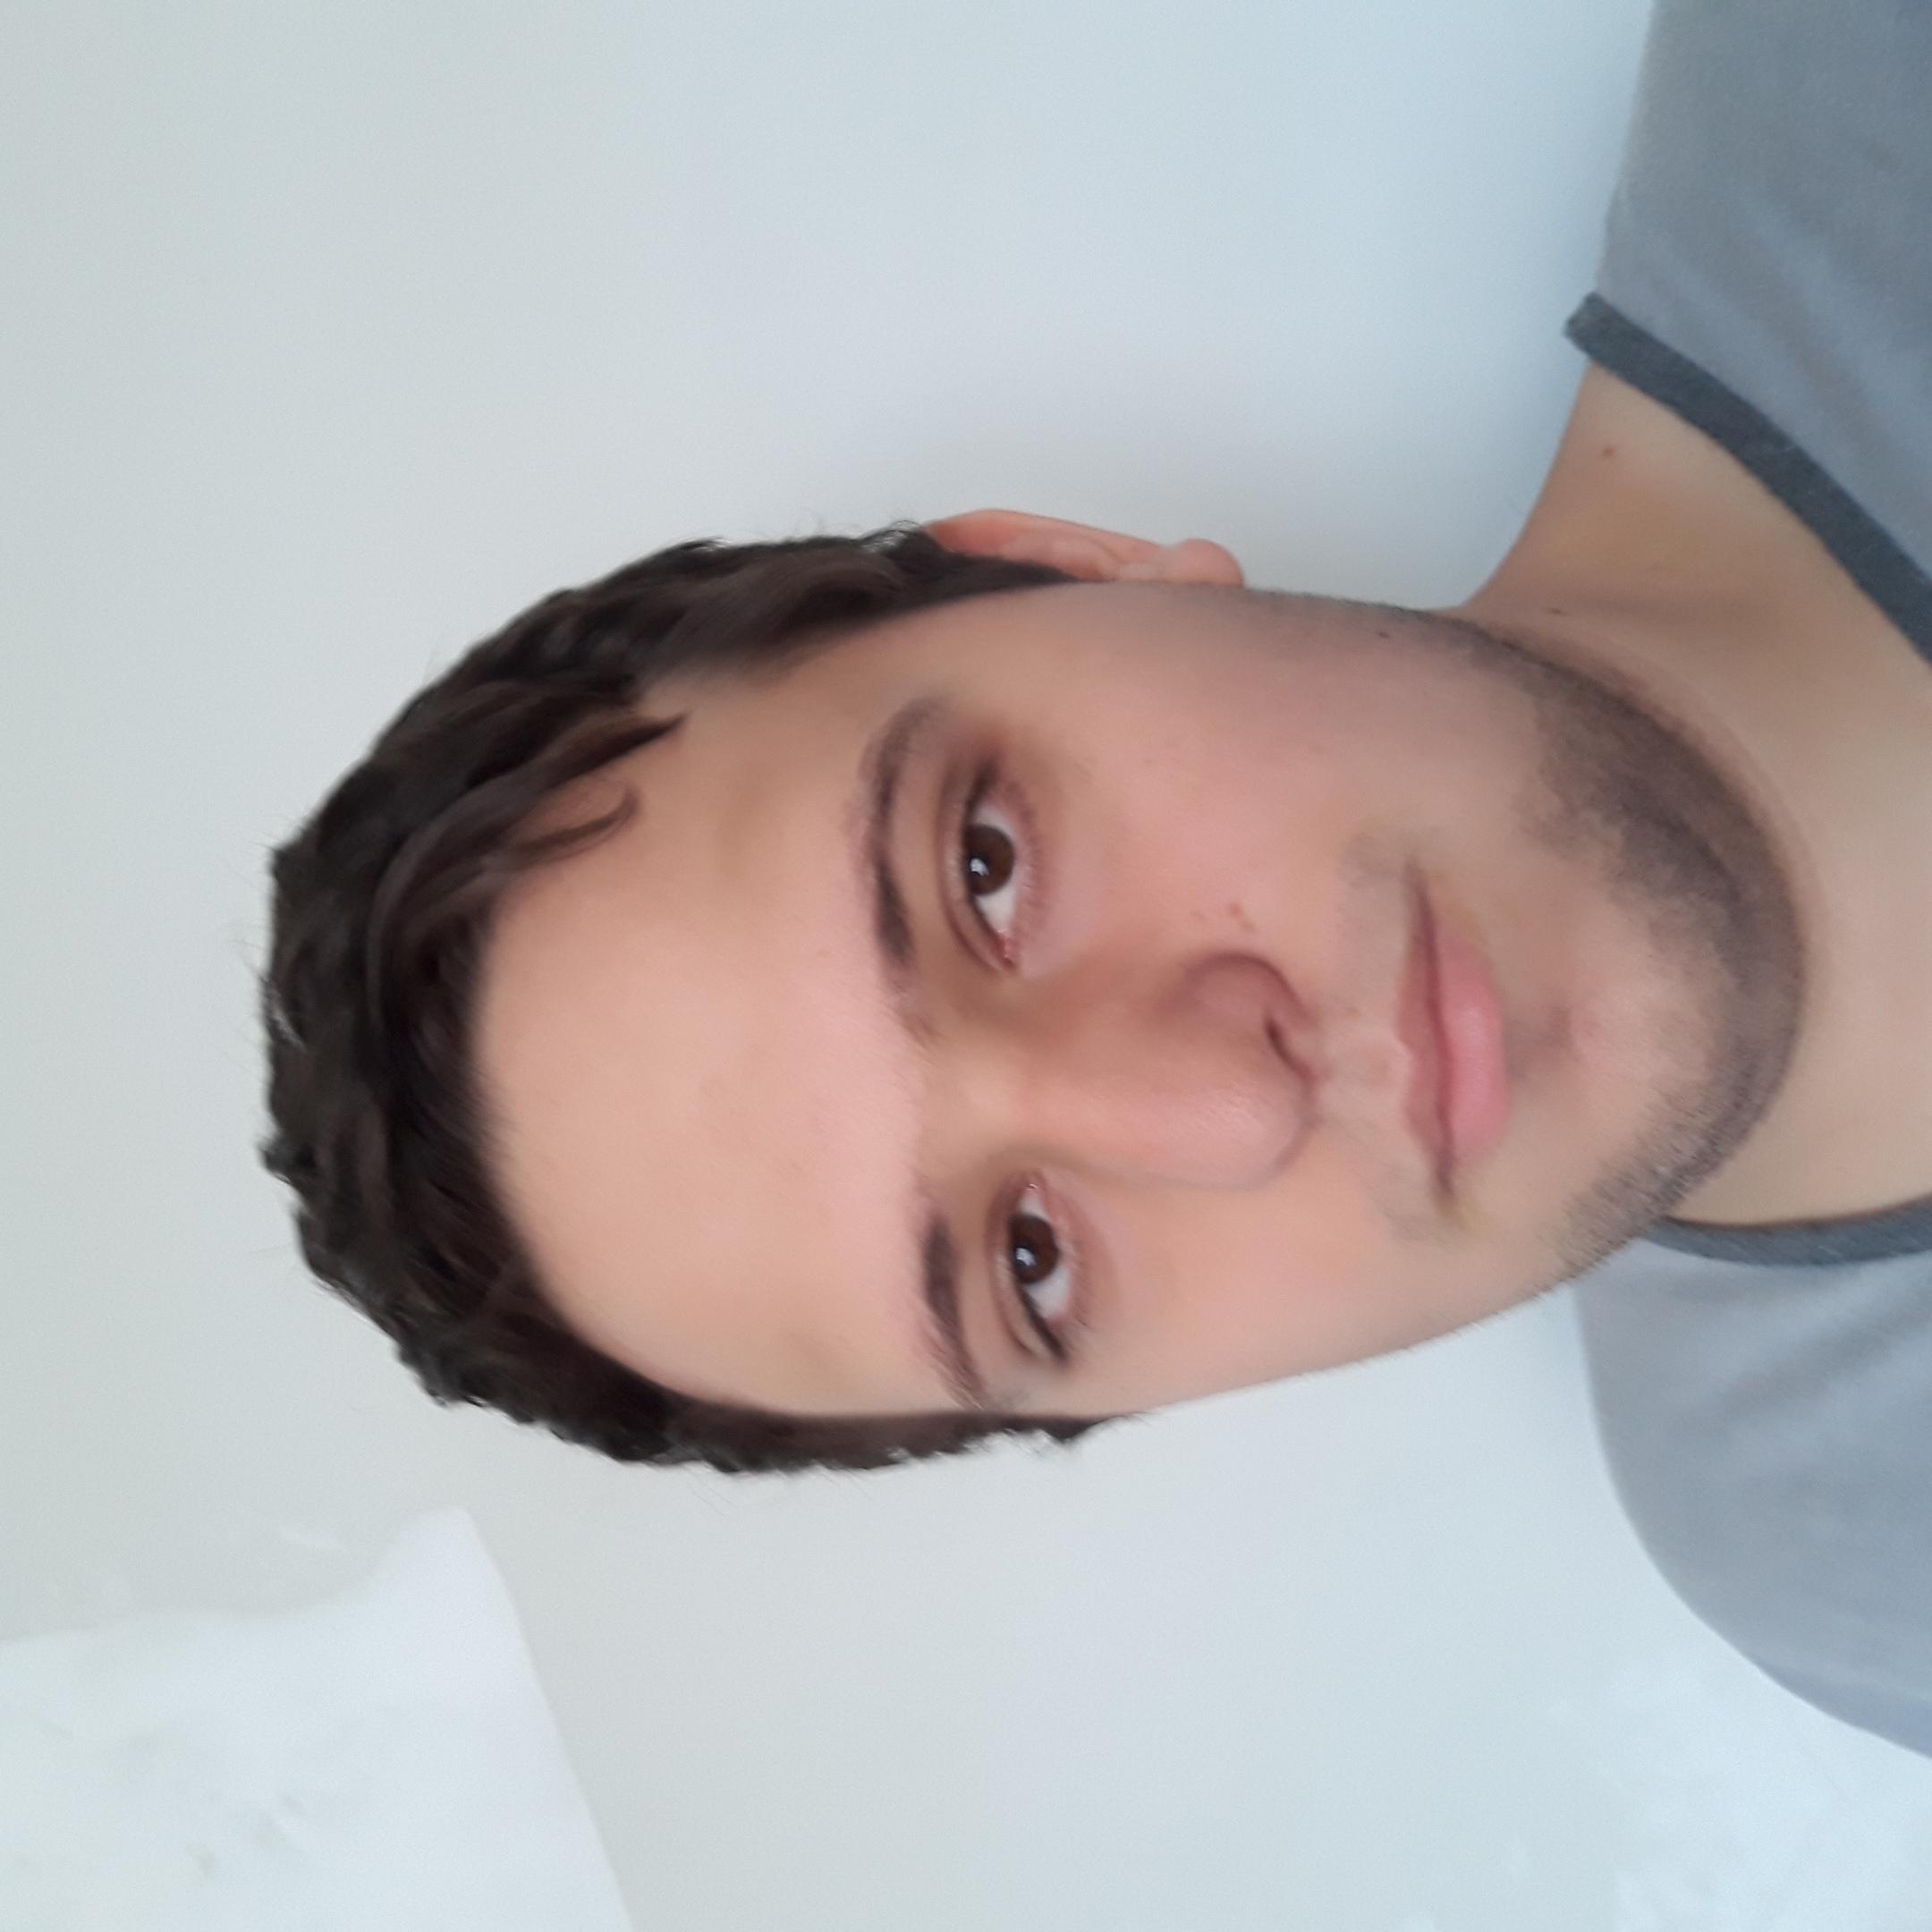 Rafael Brisola